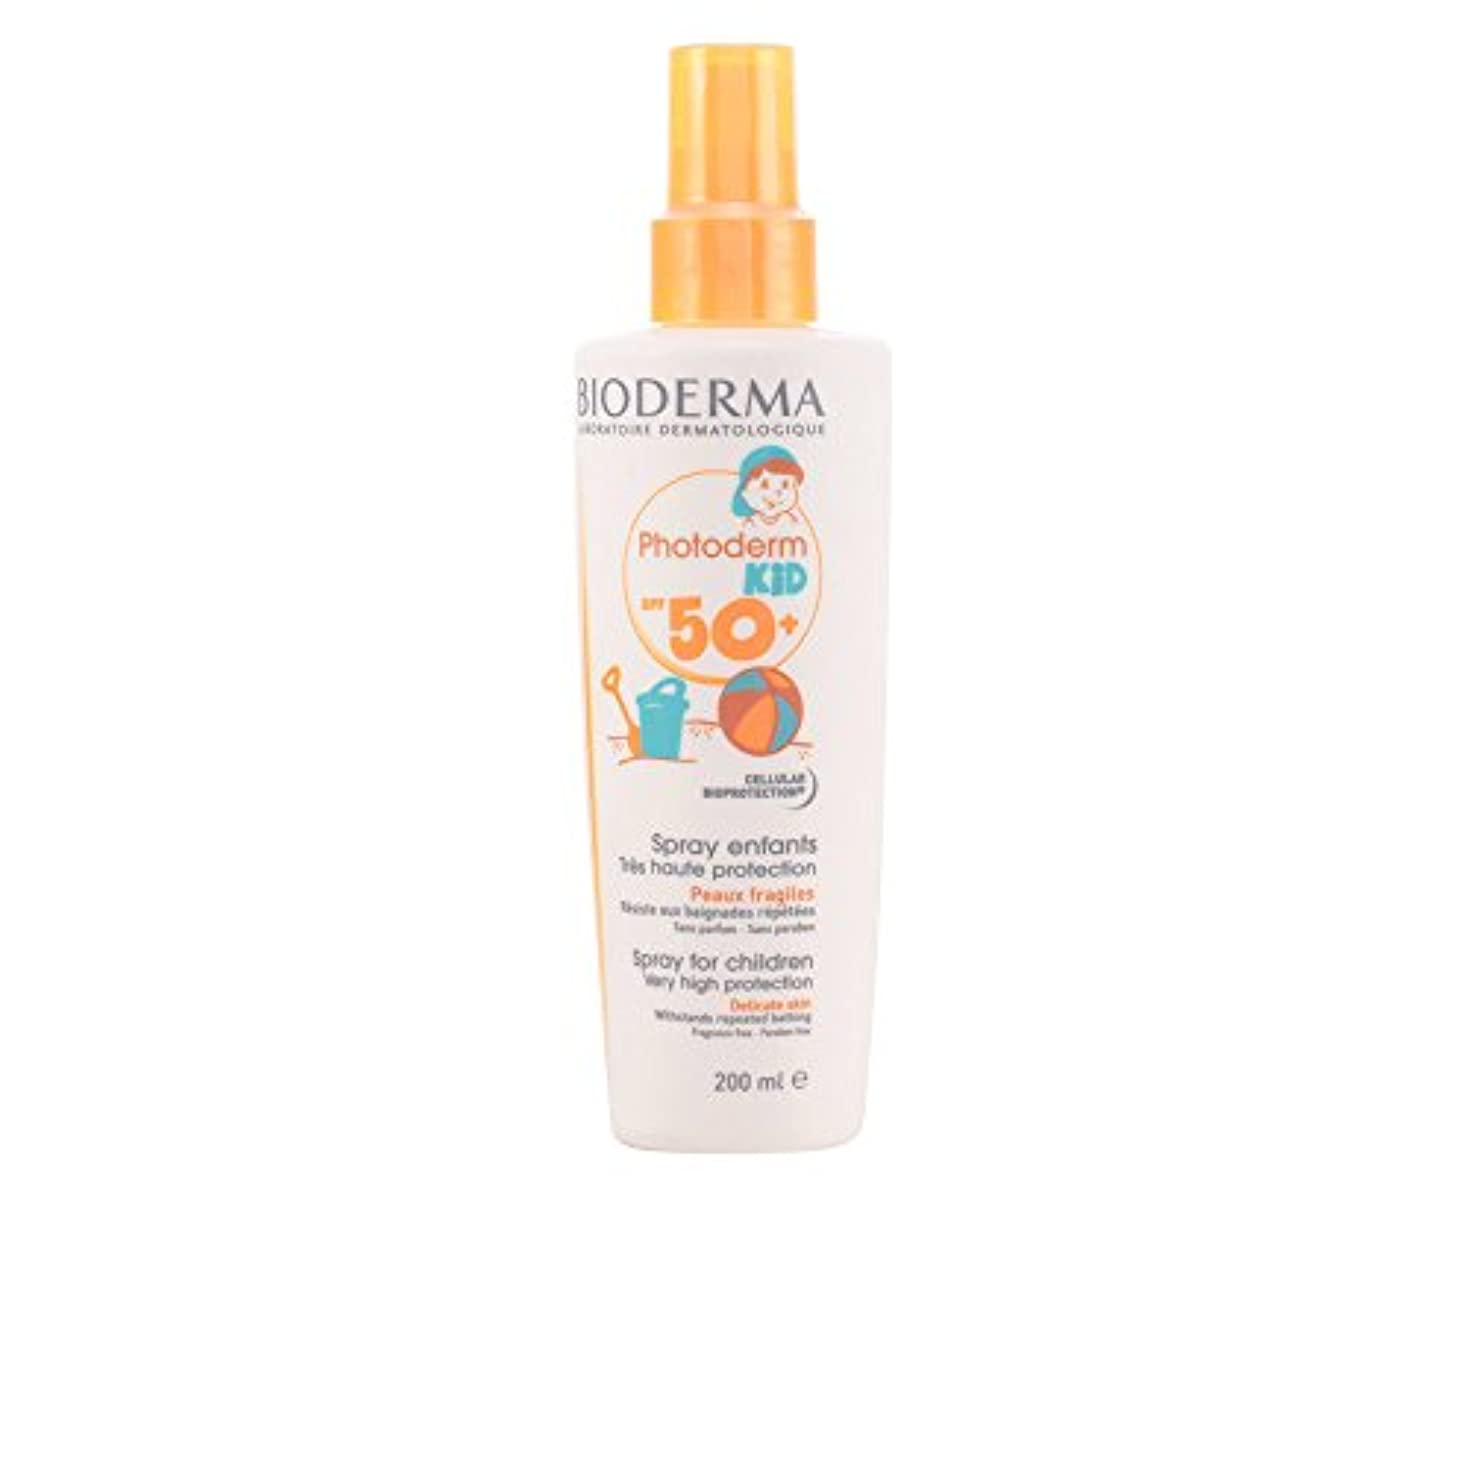 Bioderma Photoderm Kid Spf 50+ Spray 200ml